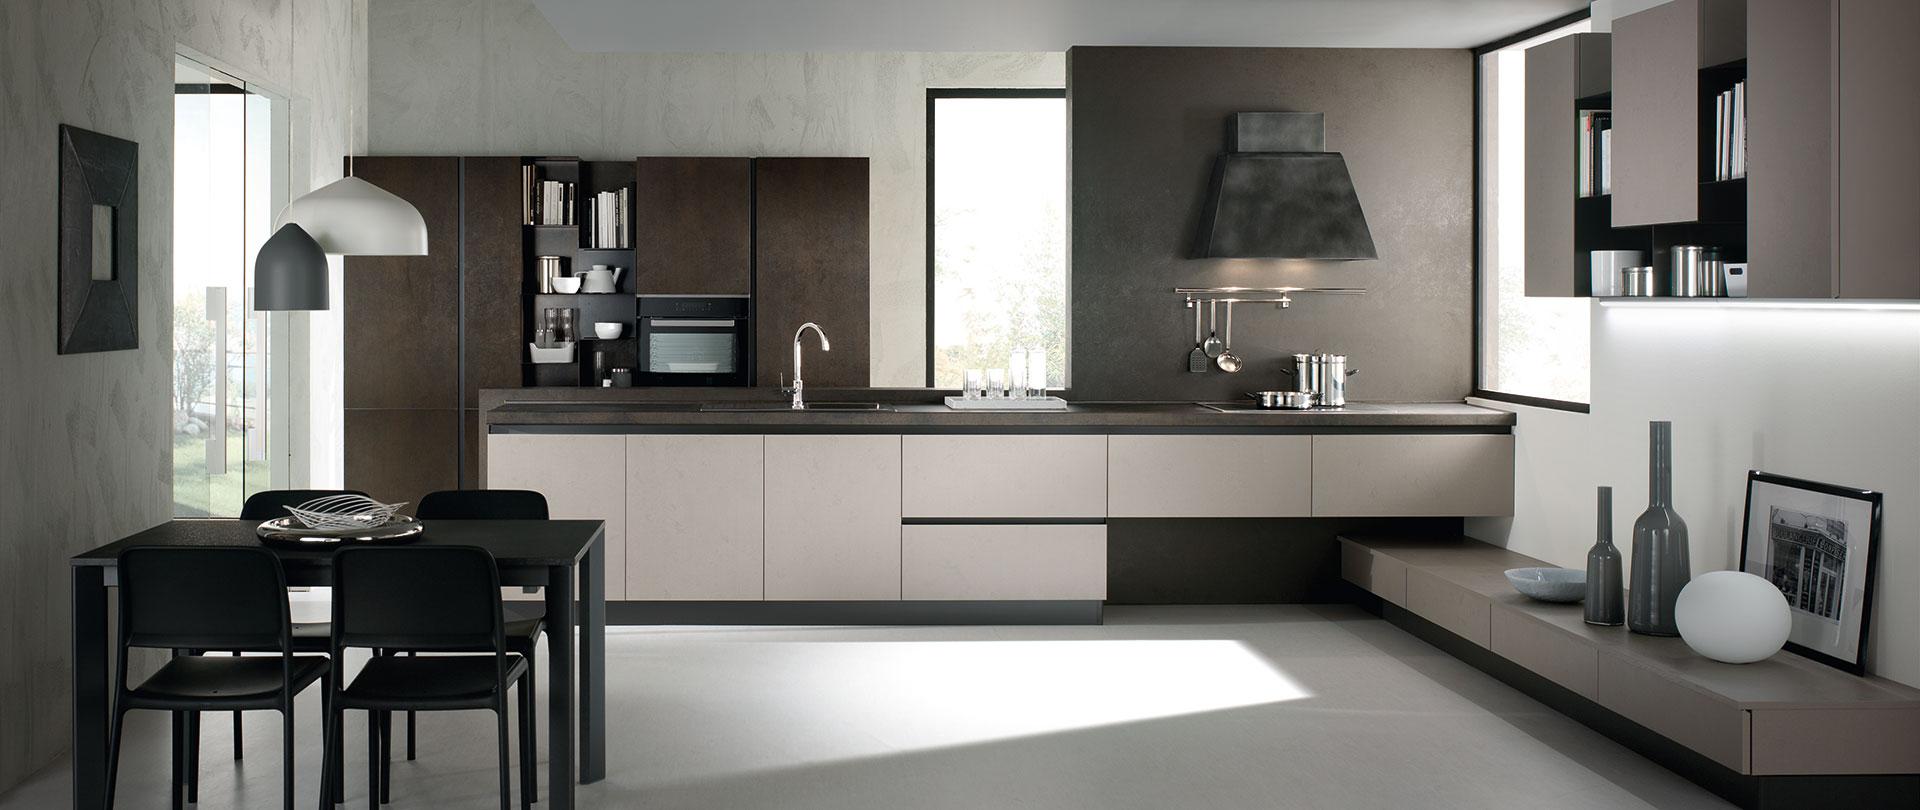 evo-cucina-agora-visone-cemento_ossido-cemento